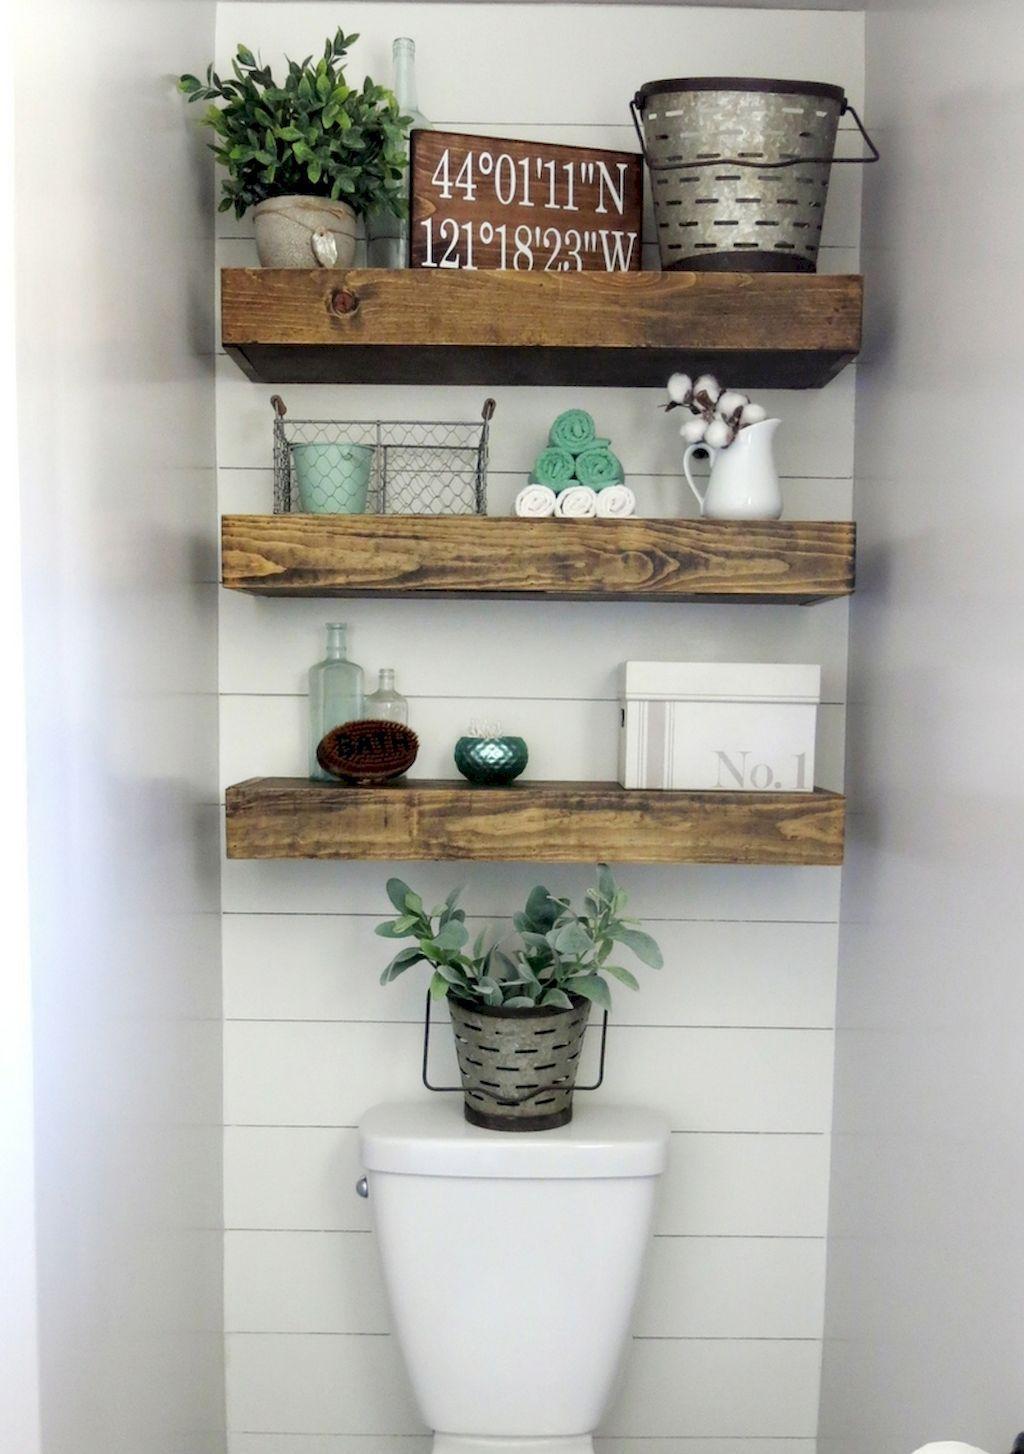 50 Tips And Tricks Bathroom Storage Shelves Organization Ideas